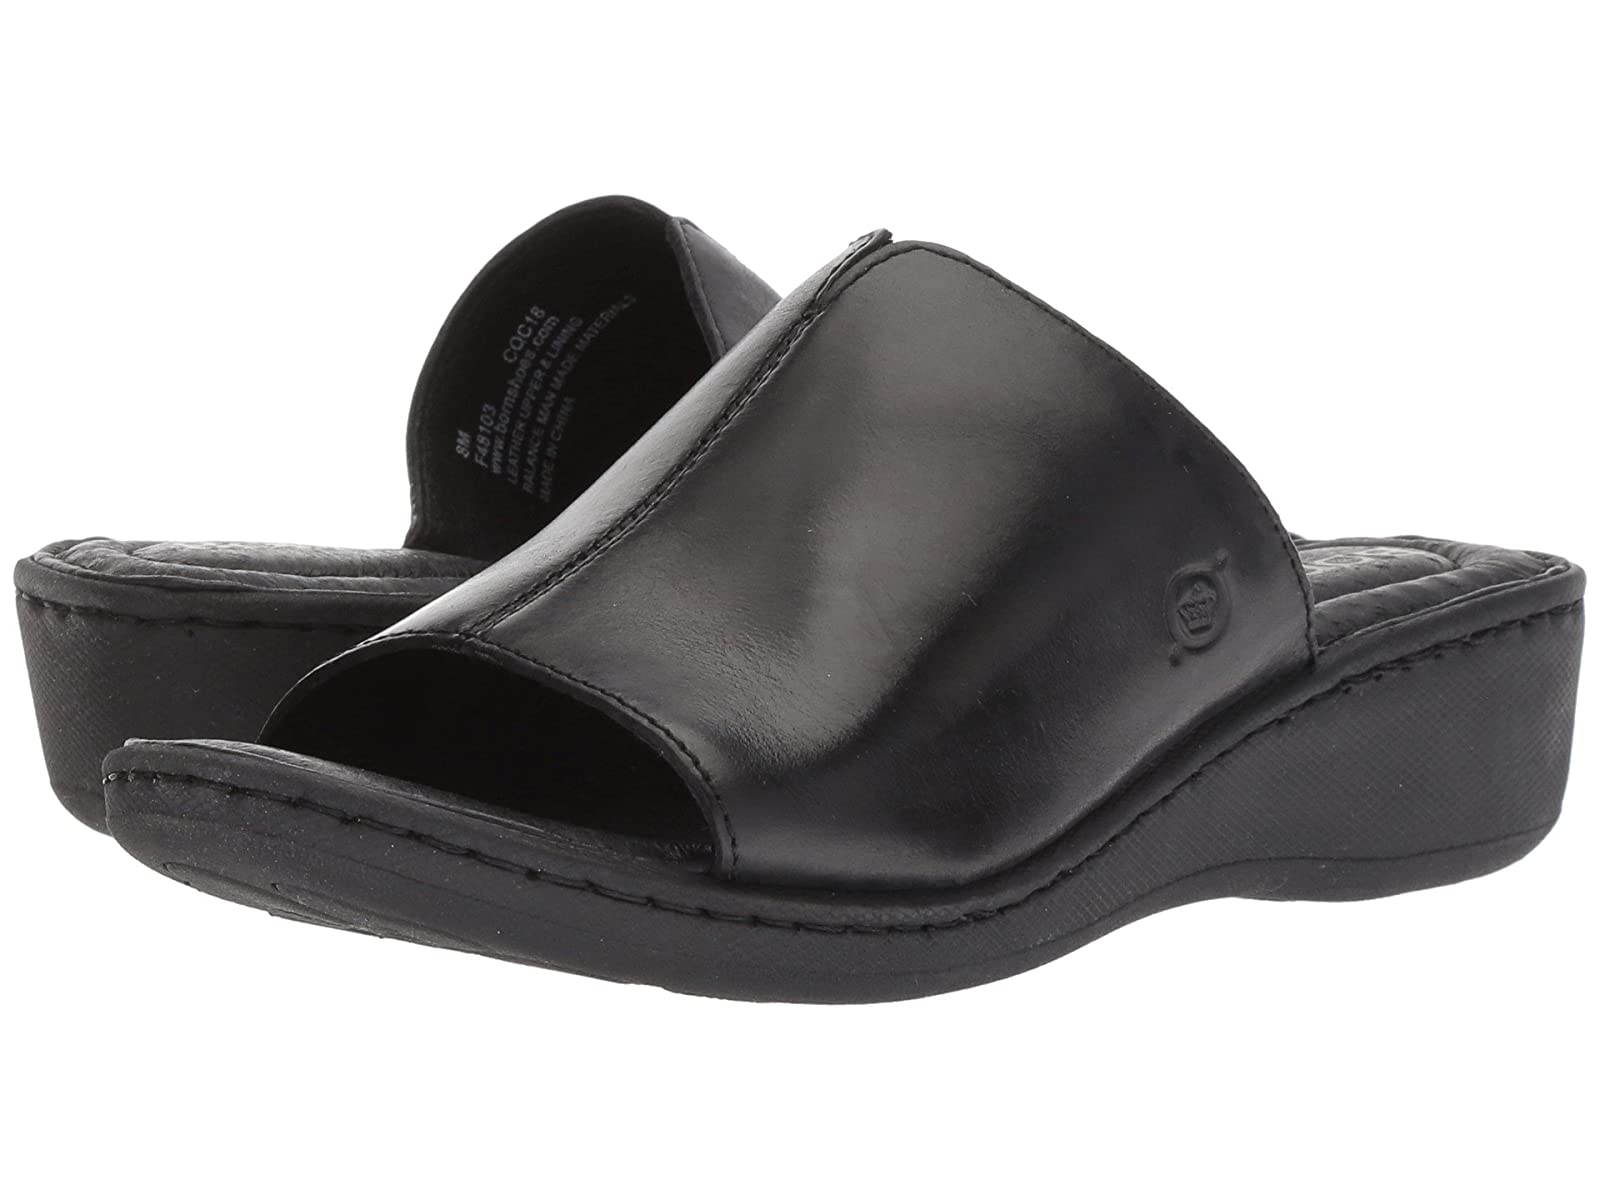 Born BerntComfortable and distinctive shoes